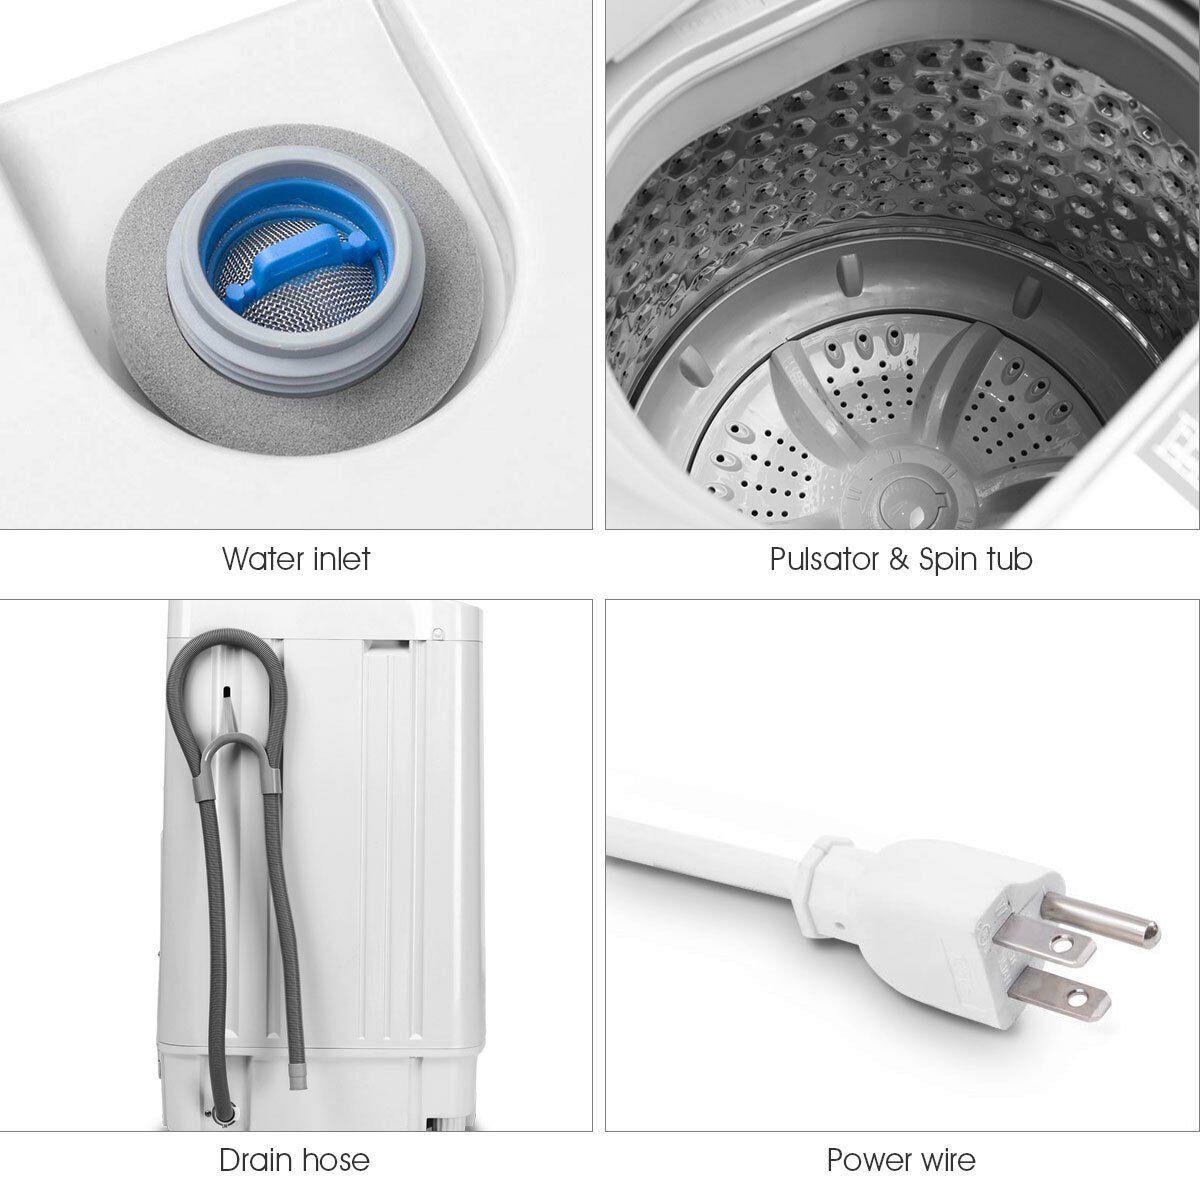 Portable Compact Washing Machine 1 34 Cu Ft Spin Washer Drain Pump 8 Water Level Walmart Com In 2020 Compact Washing Machine Automatic Washing Machine Washing Machine